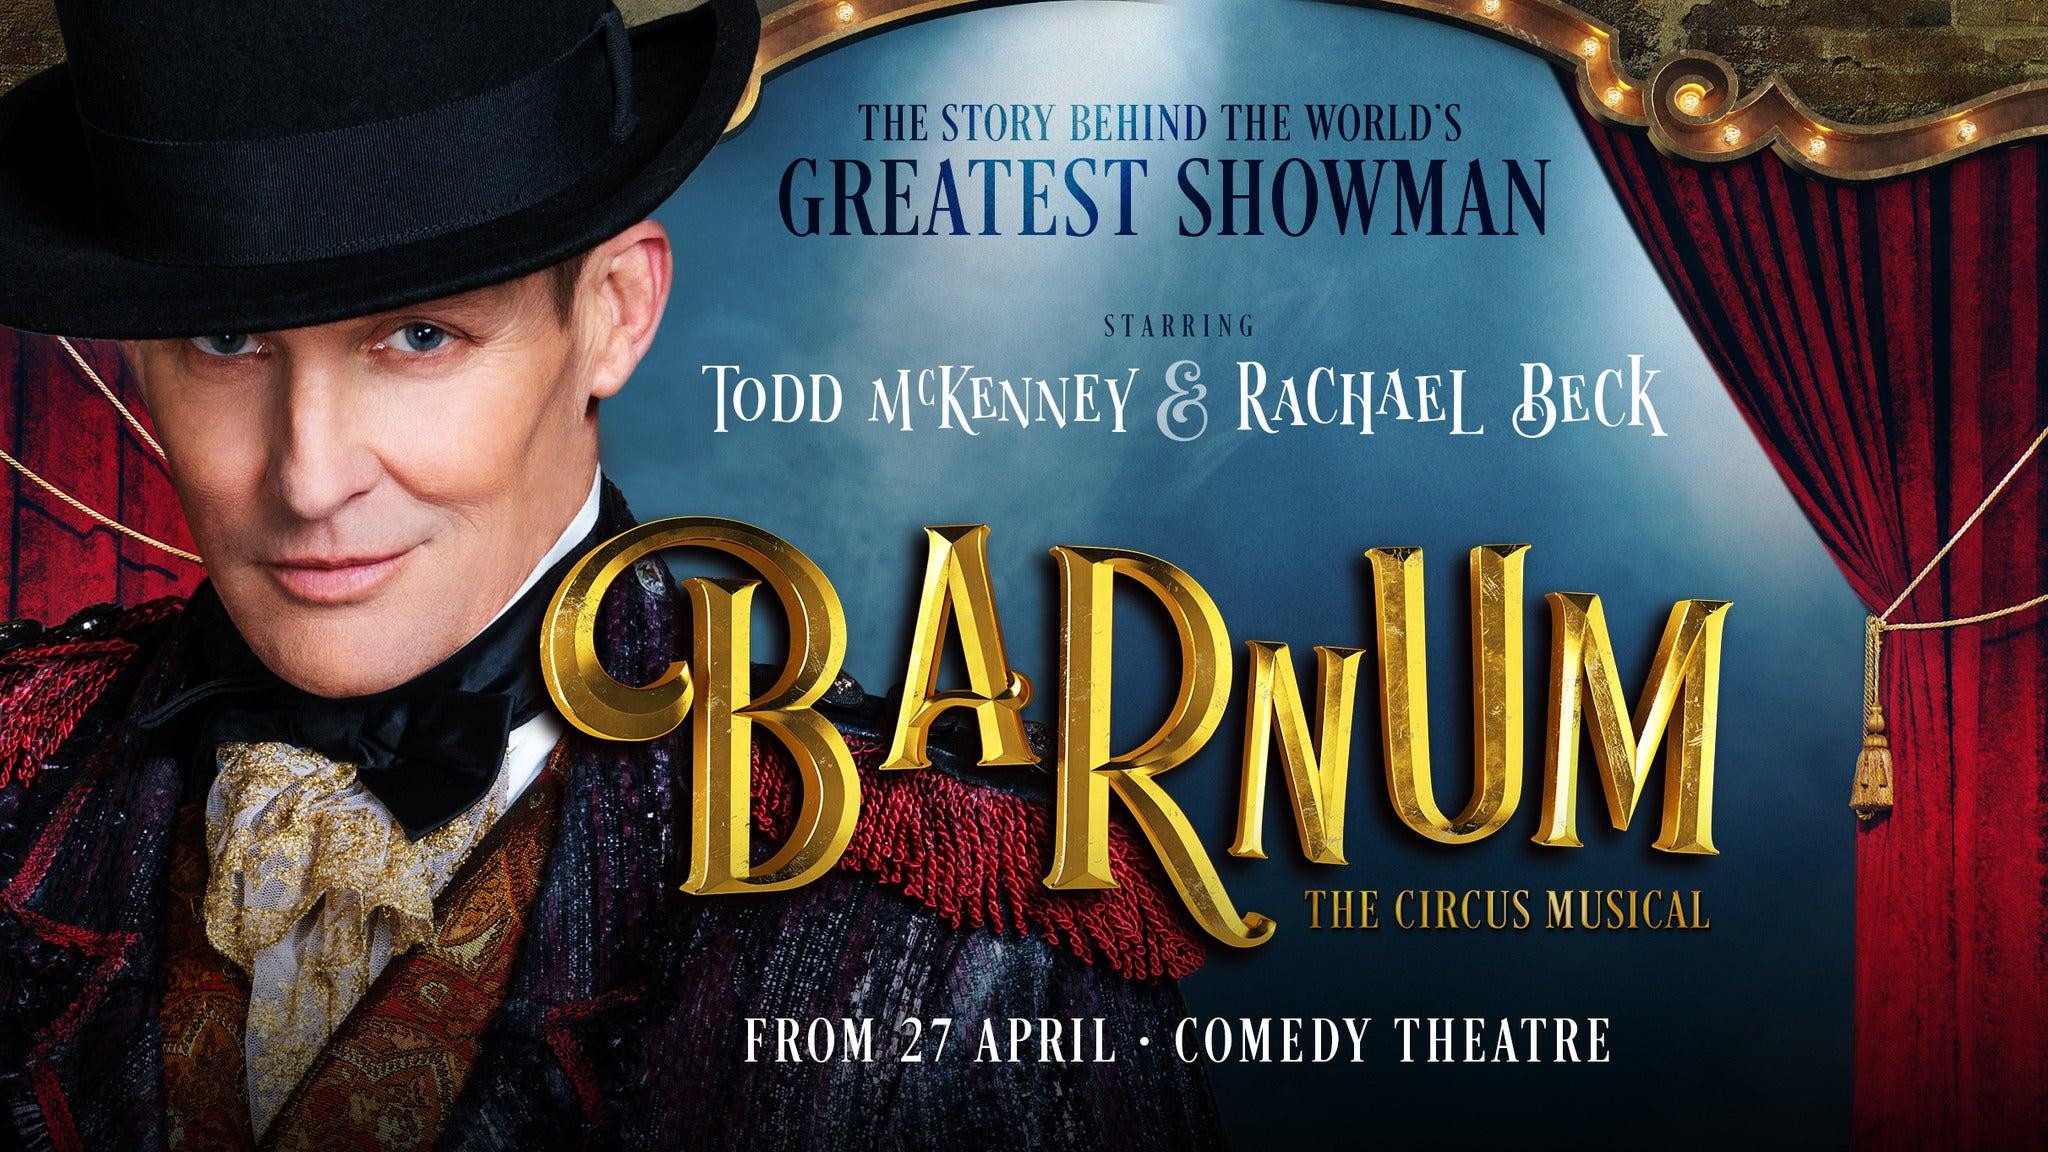 Barnum - The Circus Musical